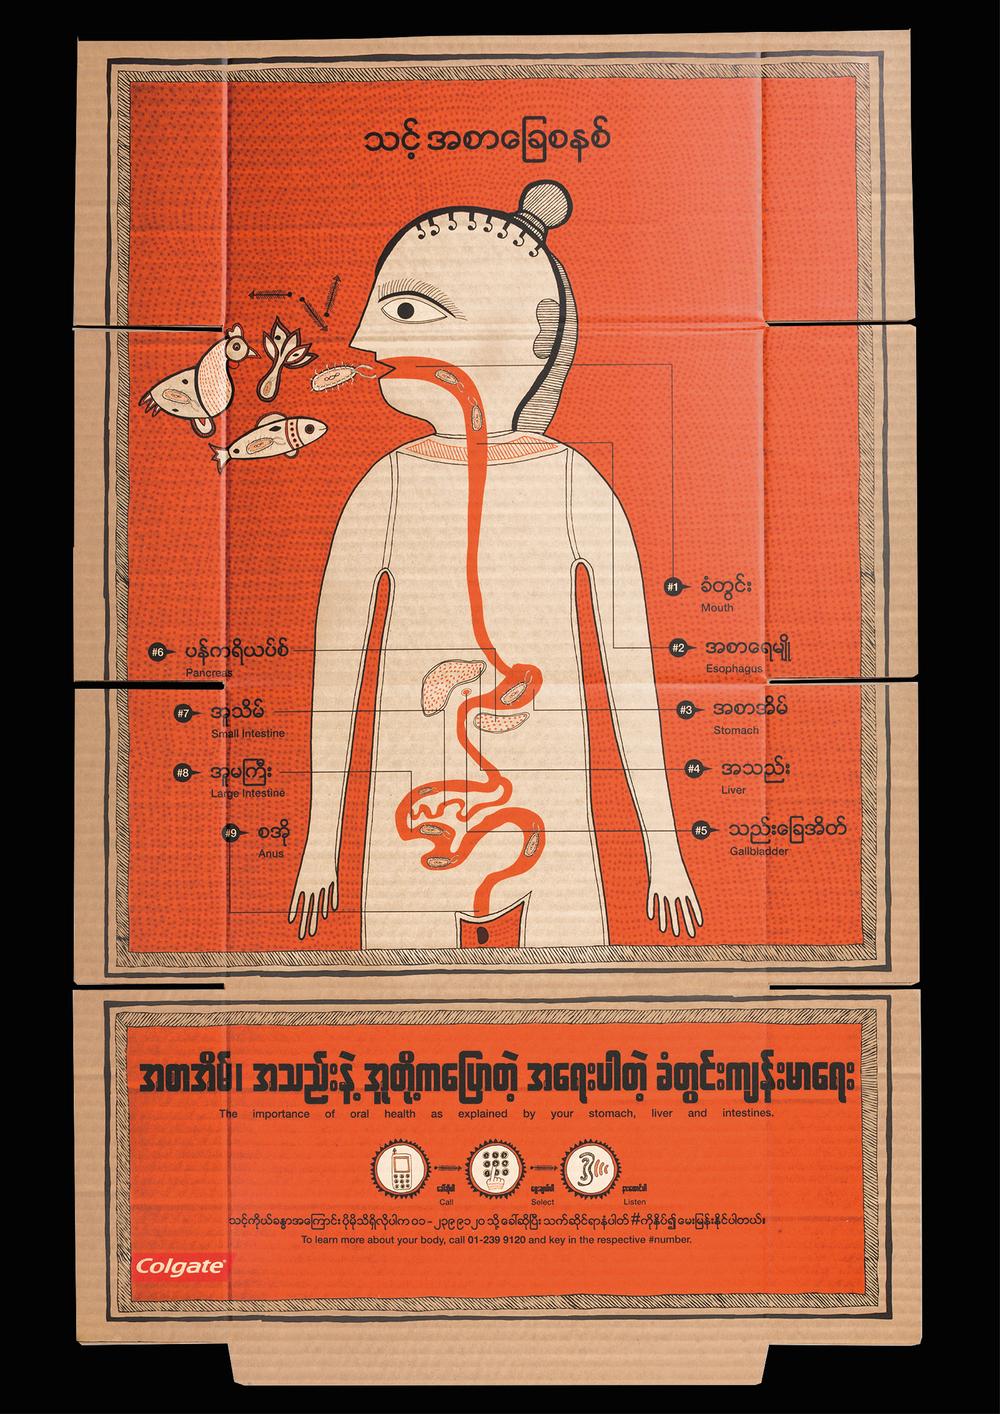 digestive-system-05.jpg